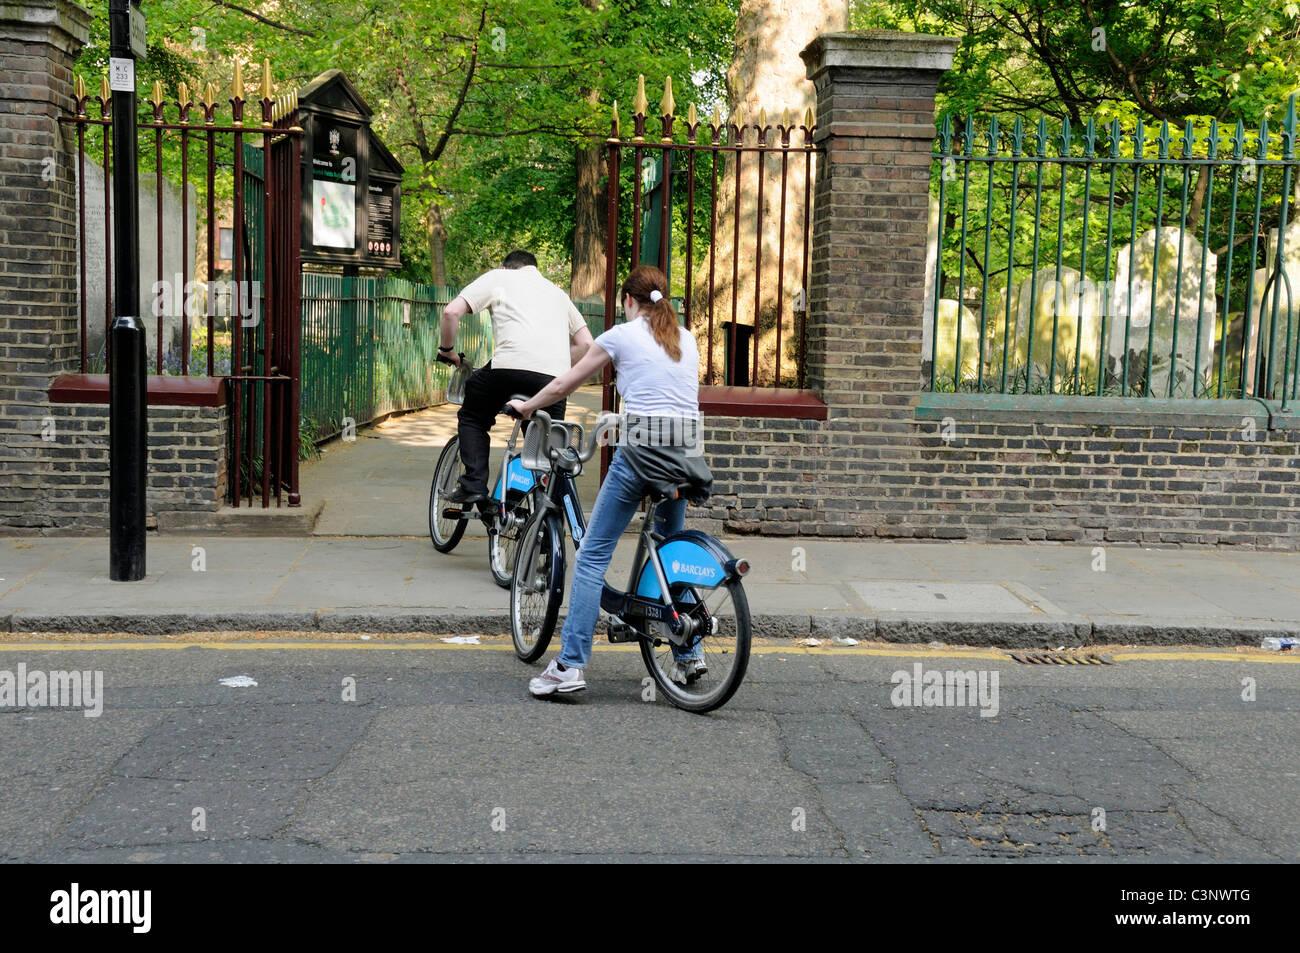 People on Barclay's bikes entering Bunhill Fields London UK - Stock Image